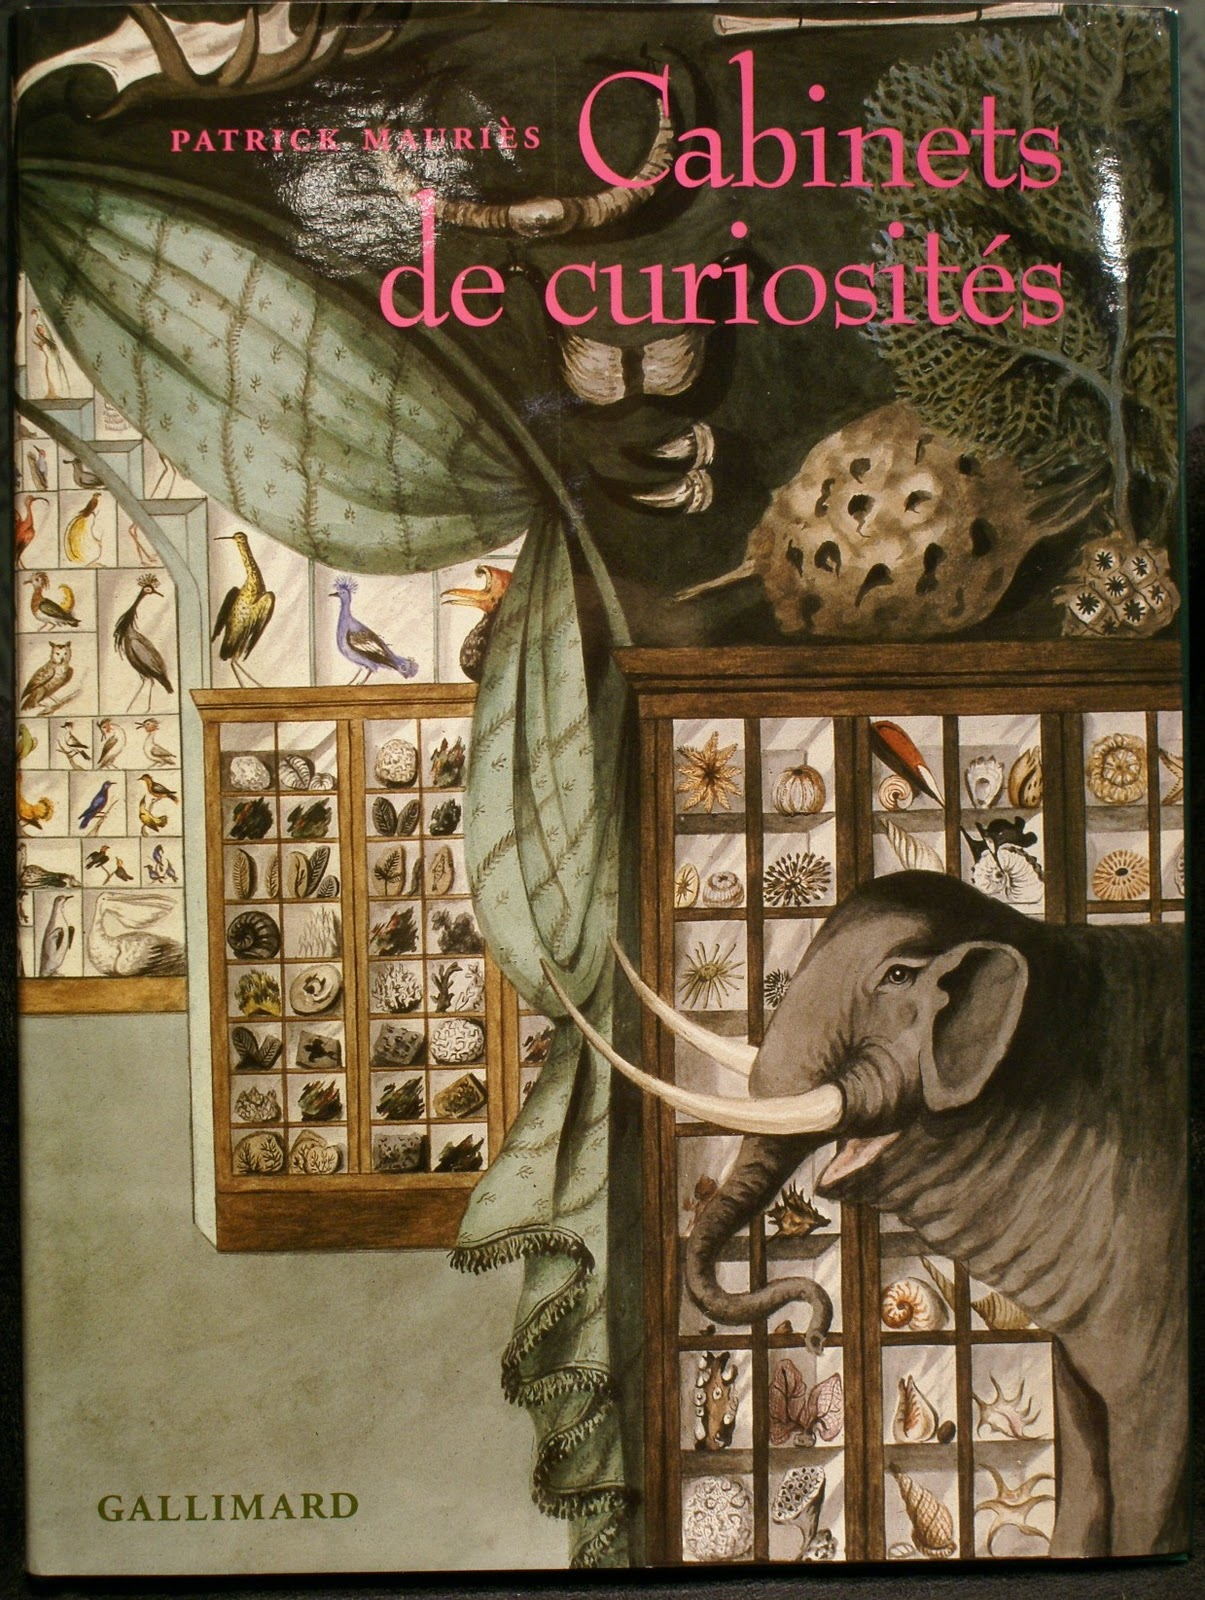 petit cabinet de curiosit s cabinets de curiosit s. Black Bedroom Furniture Sets. Home Design Ideas